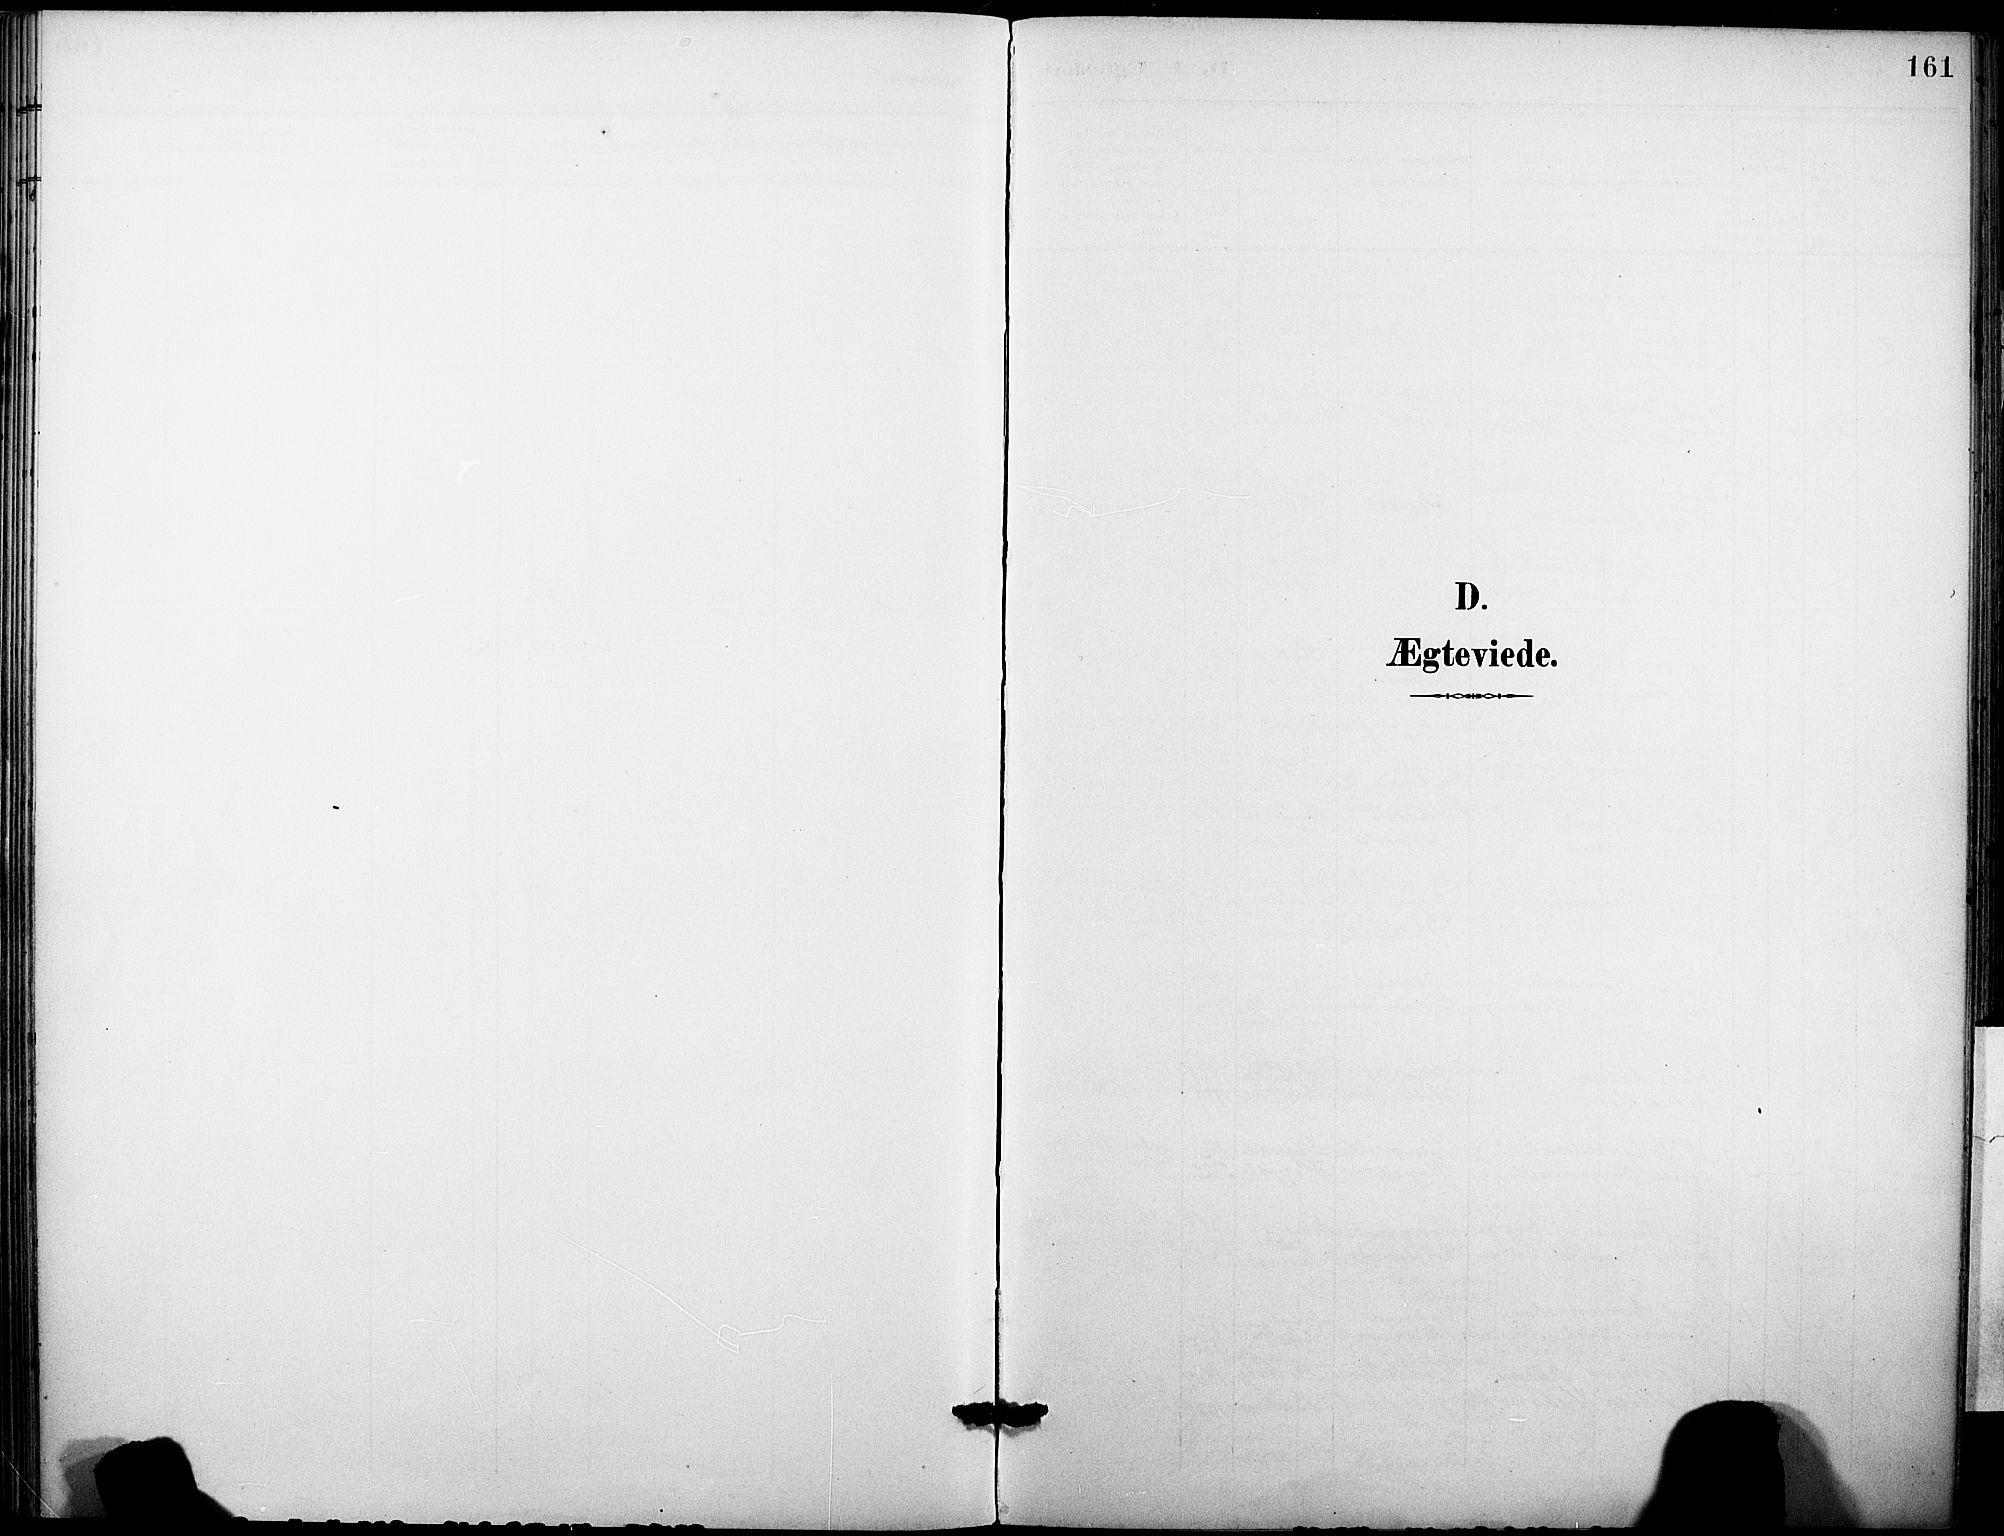 SAKO, Holla kirkebøker, F/Fa/L0010: Ministerialbok nr. 10, 1897-1907, s. 161